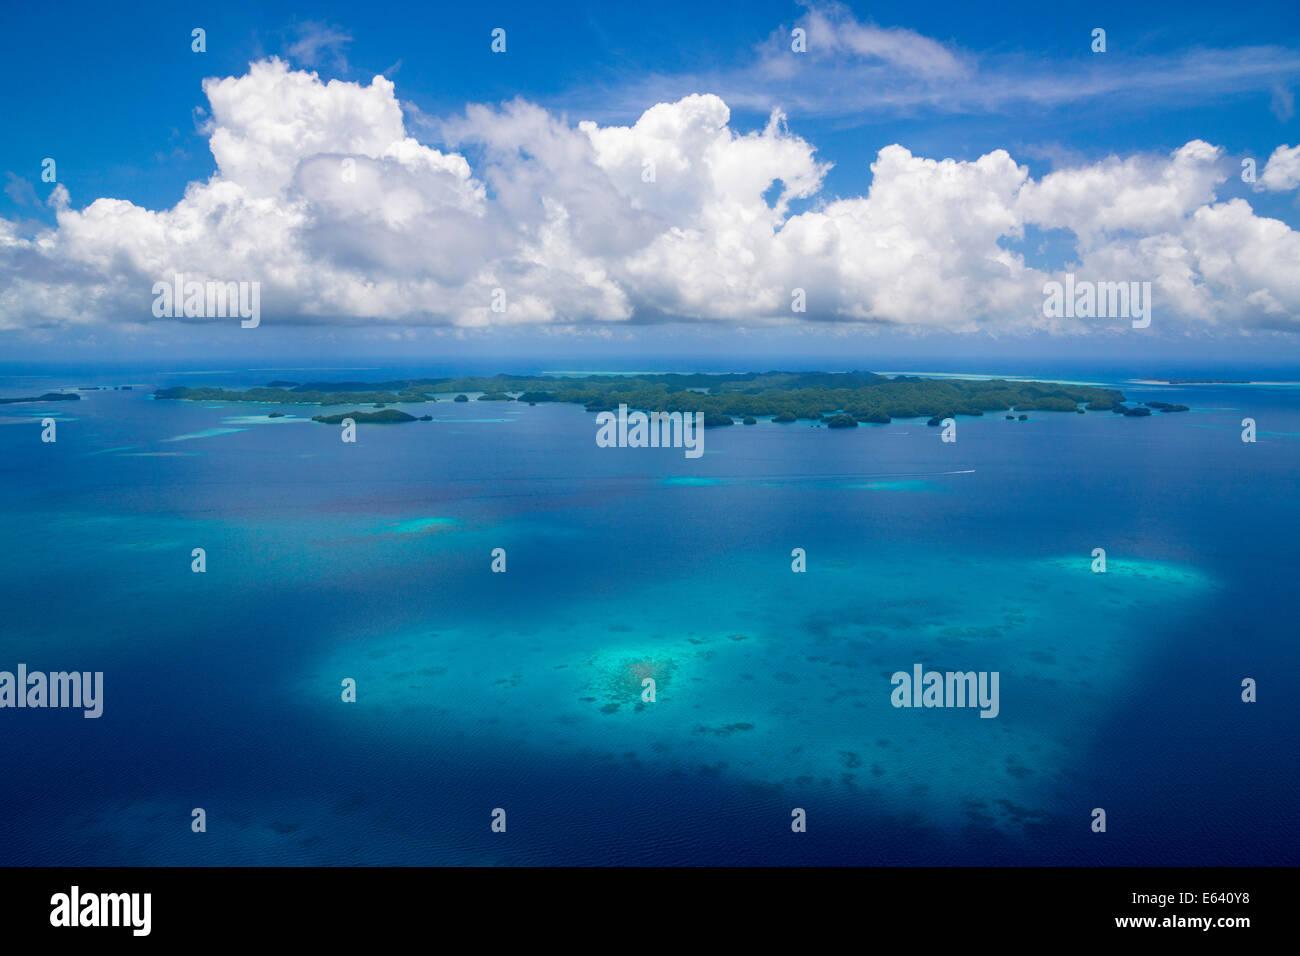 Le barriere coralline, isola paradiso, Palau, Stati Federati di Micronesia Immagini Stock